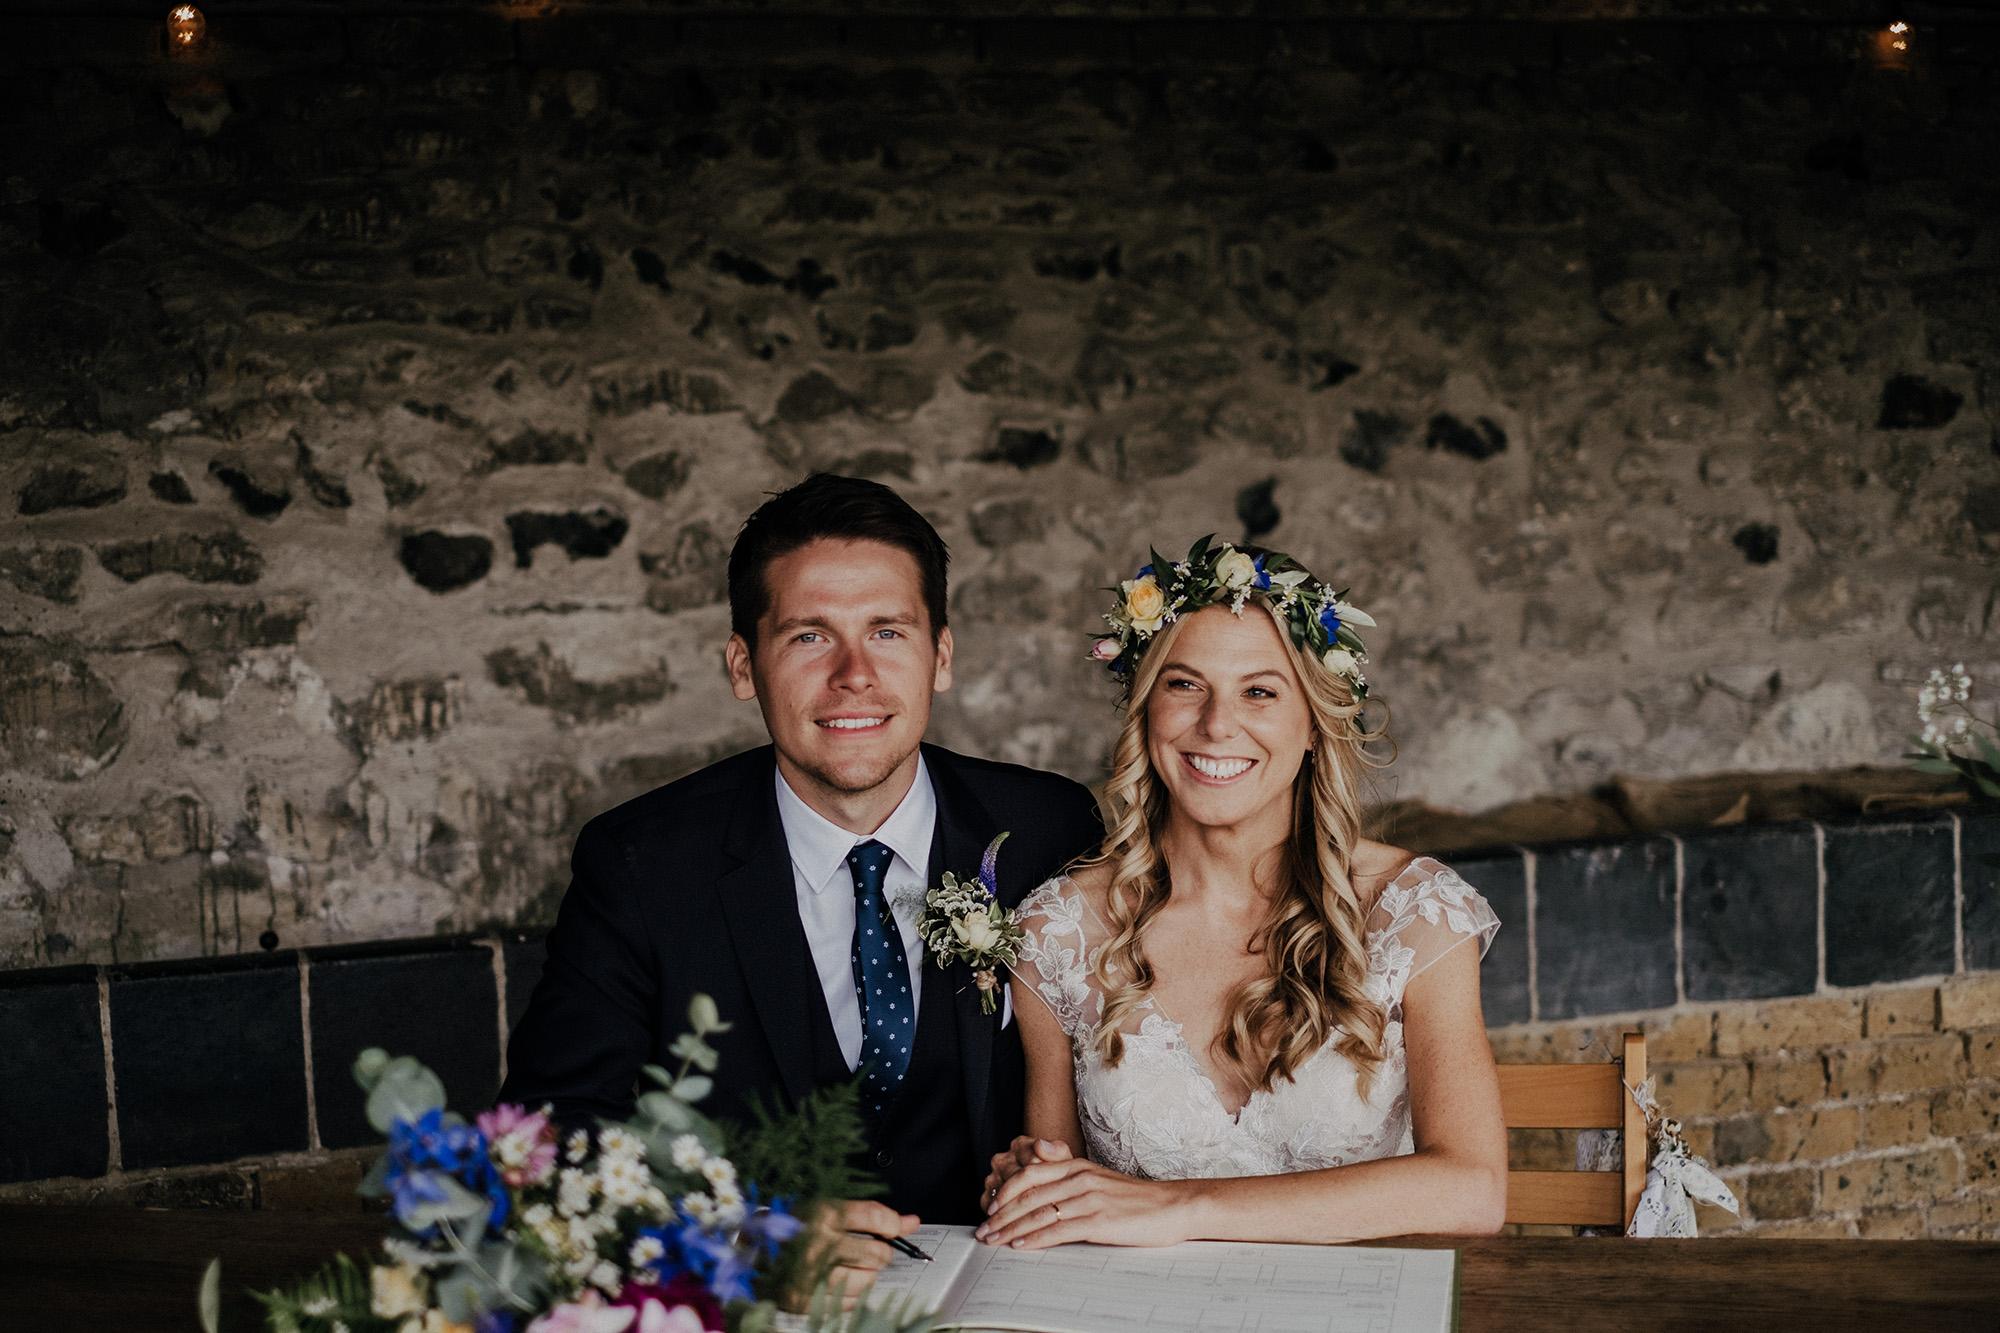 Natural-wedding-photographer-kent.jpg